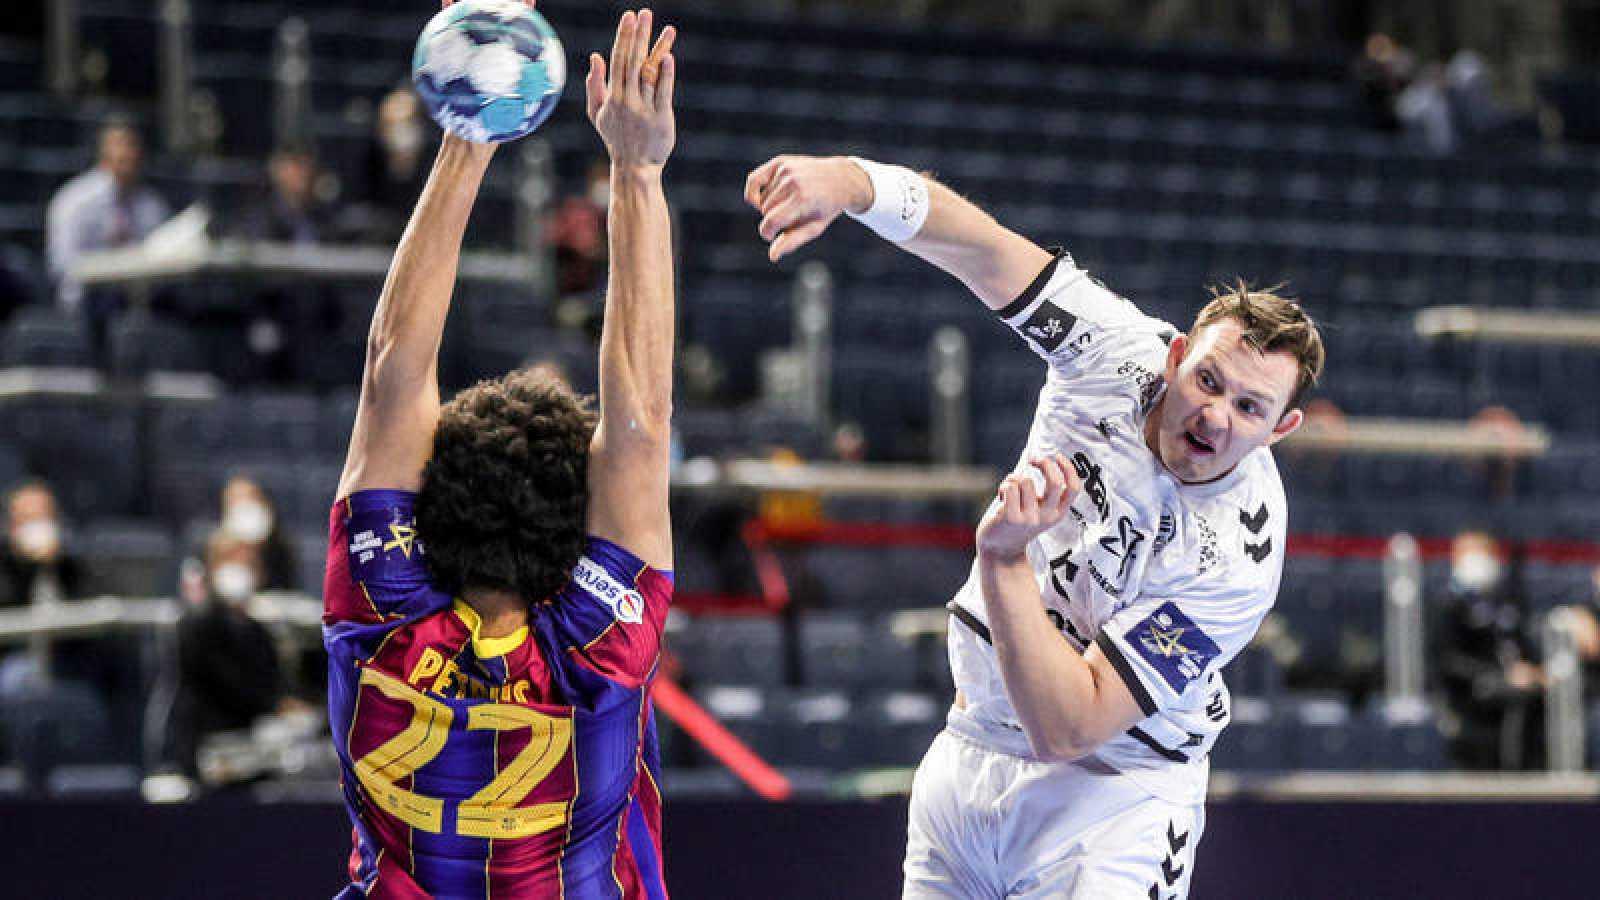 Champions de balonmano | El Kiel gana la final al Barça